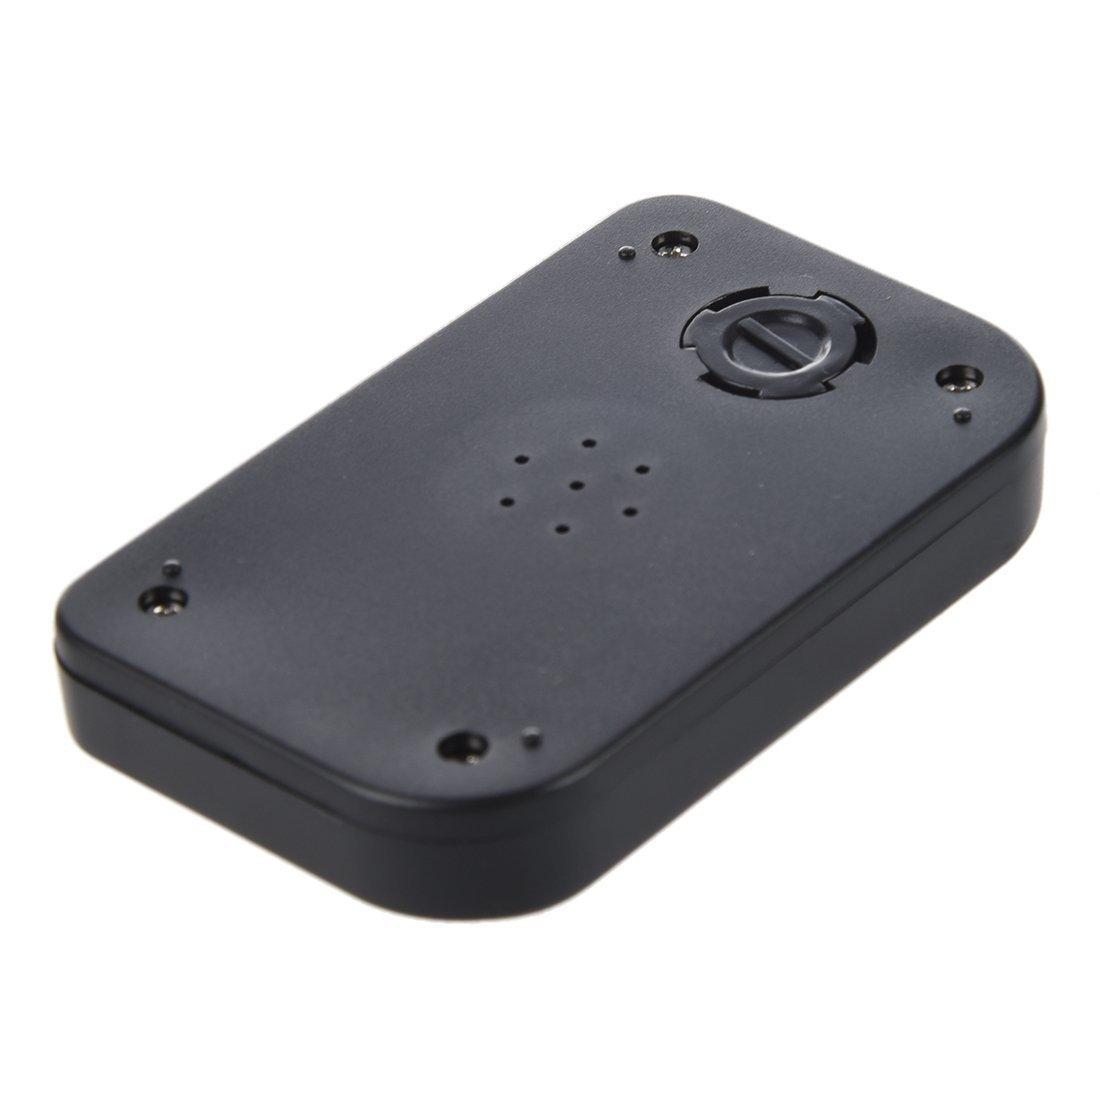 R SODIAL Pocket Sized Digital Electronic Travel Clock